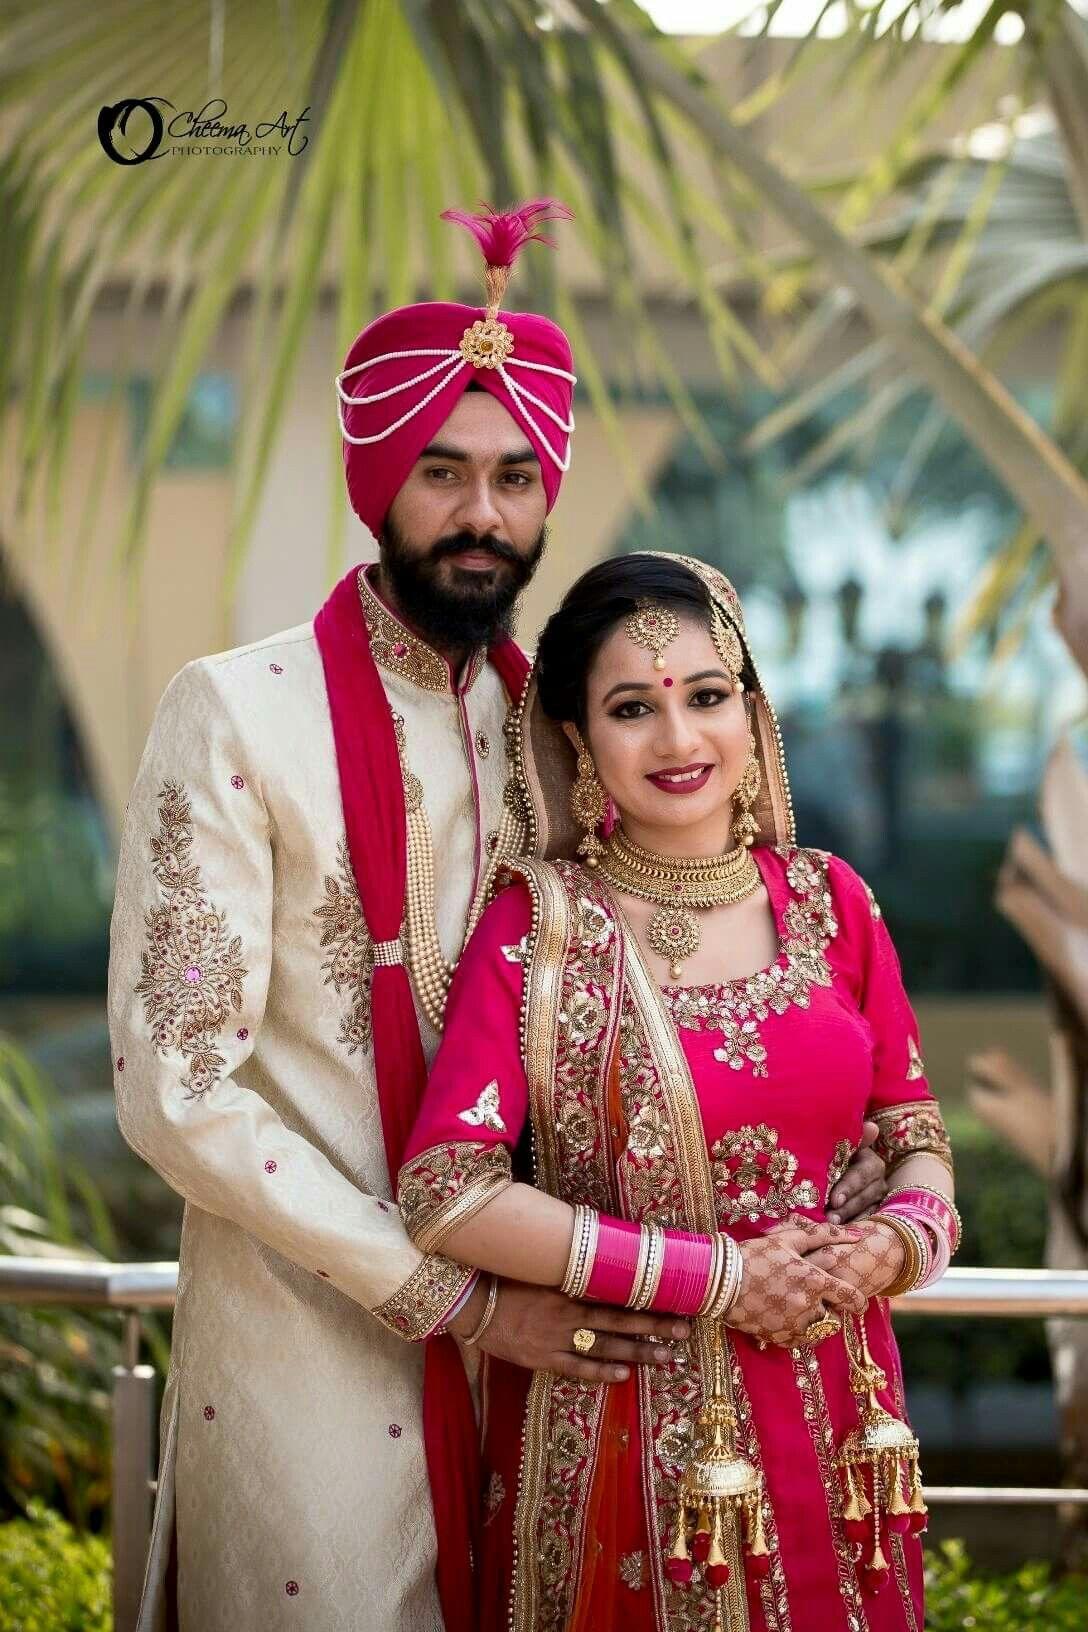 Pin By Srinivas Nymthabad On Couple Wedding Couples Photography Indian Wedding Couple Photography Indian Wedding Photography Couples